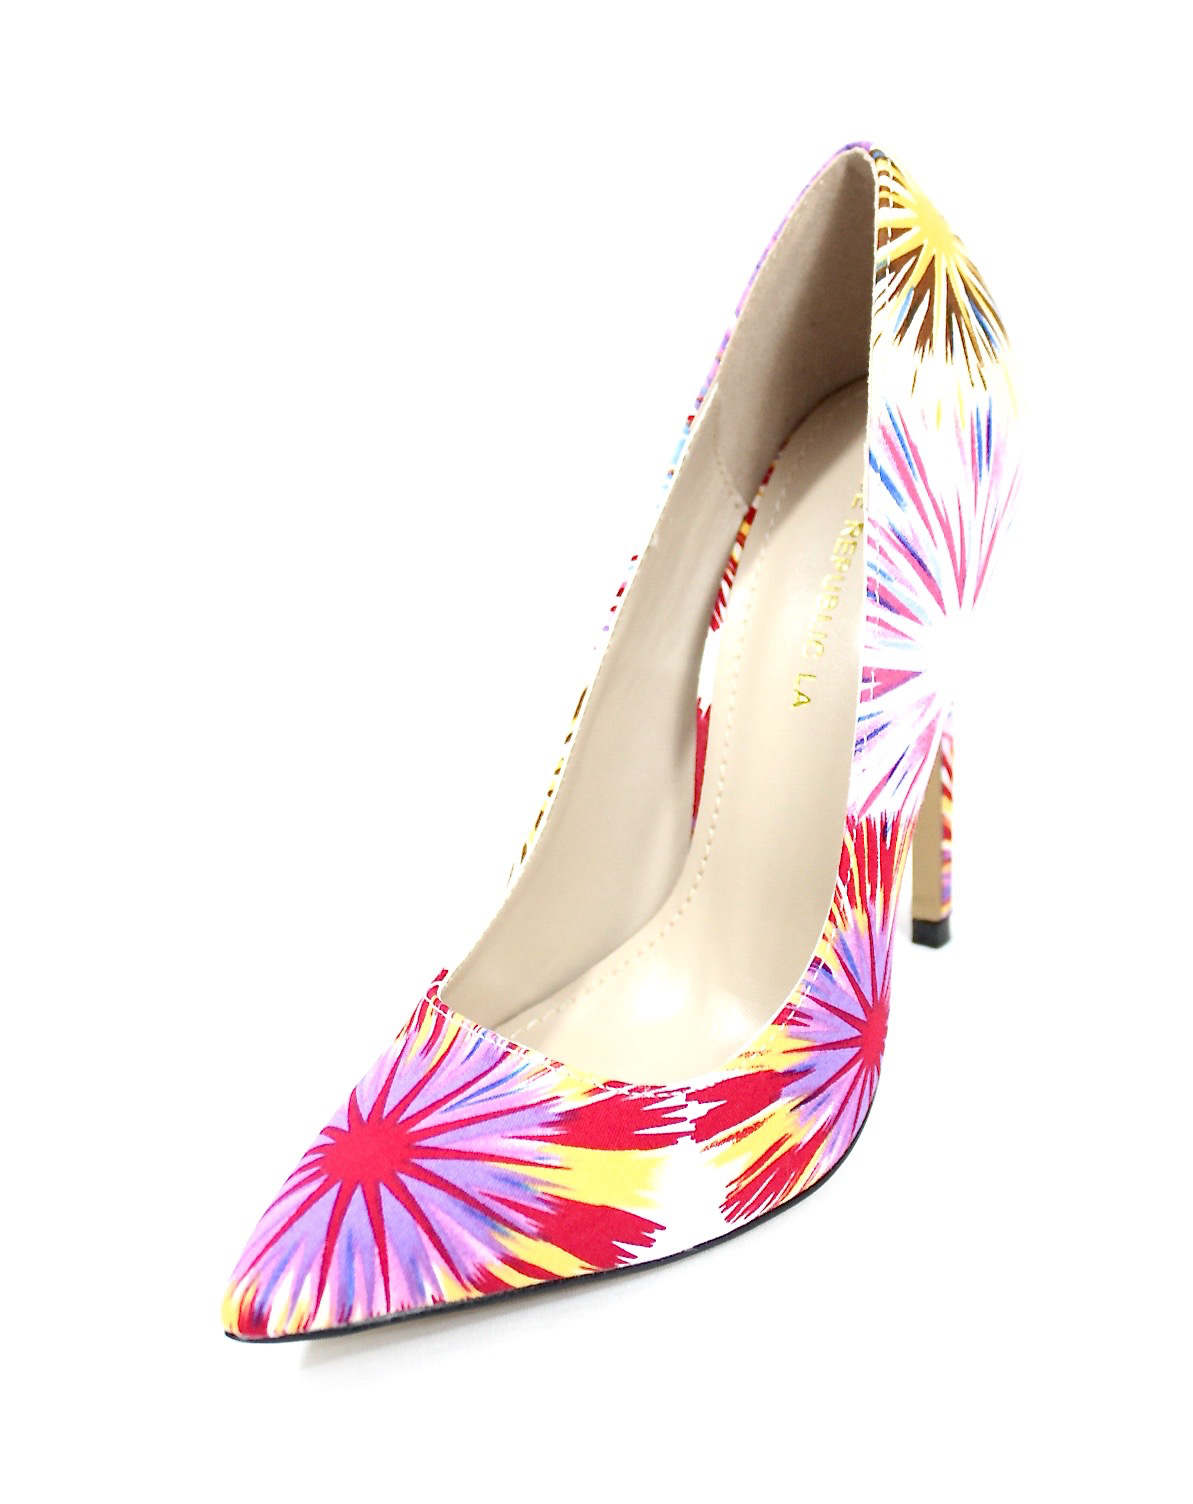 Shoe Republic Cajun White Pointy Toe Pumps-4556